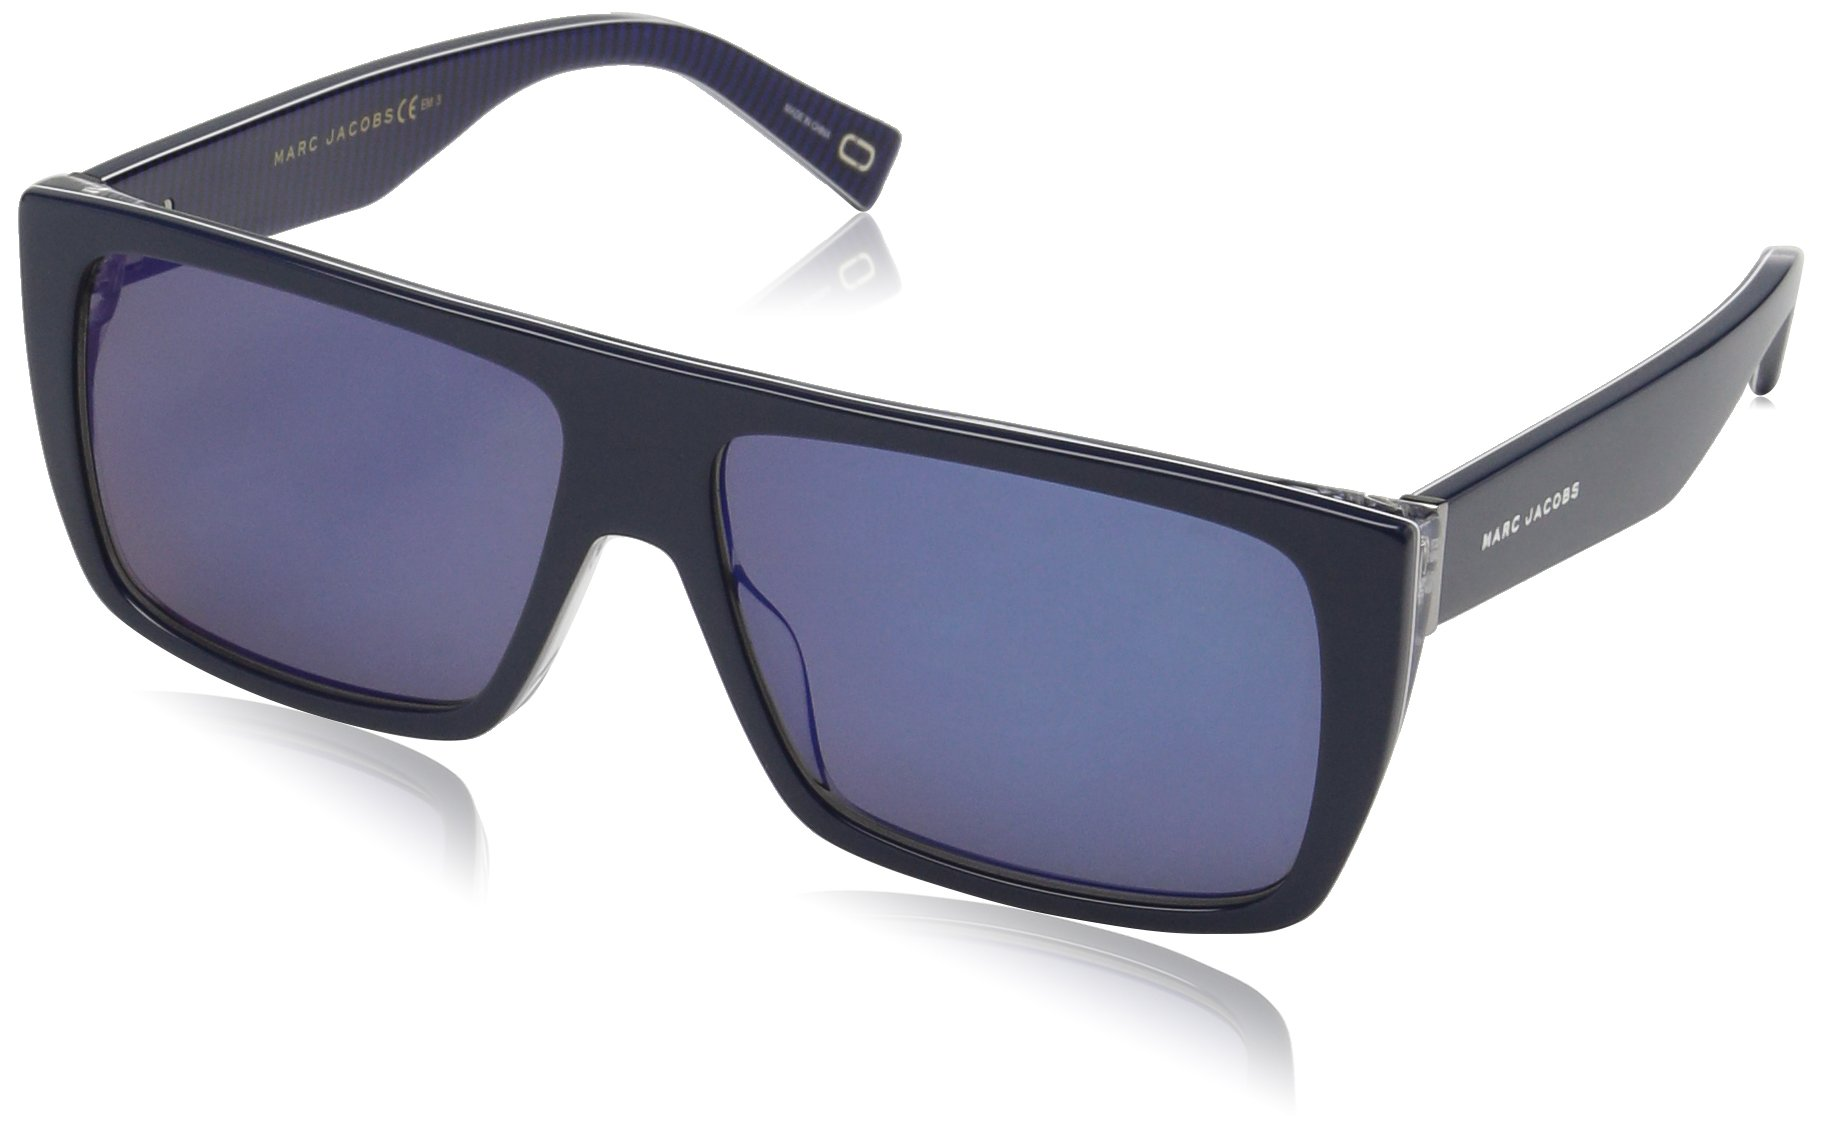 Marc Jacobs Marc096s Rectangular Sunglasses, Strip Blu, 57 mm